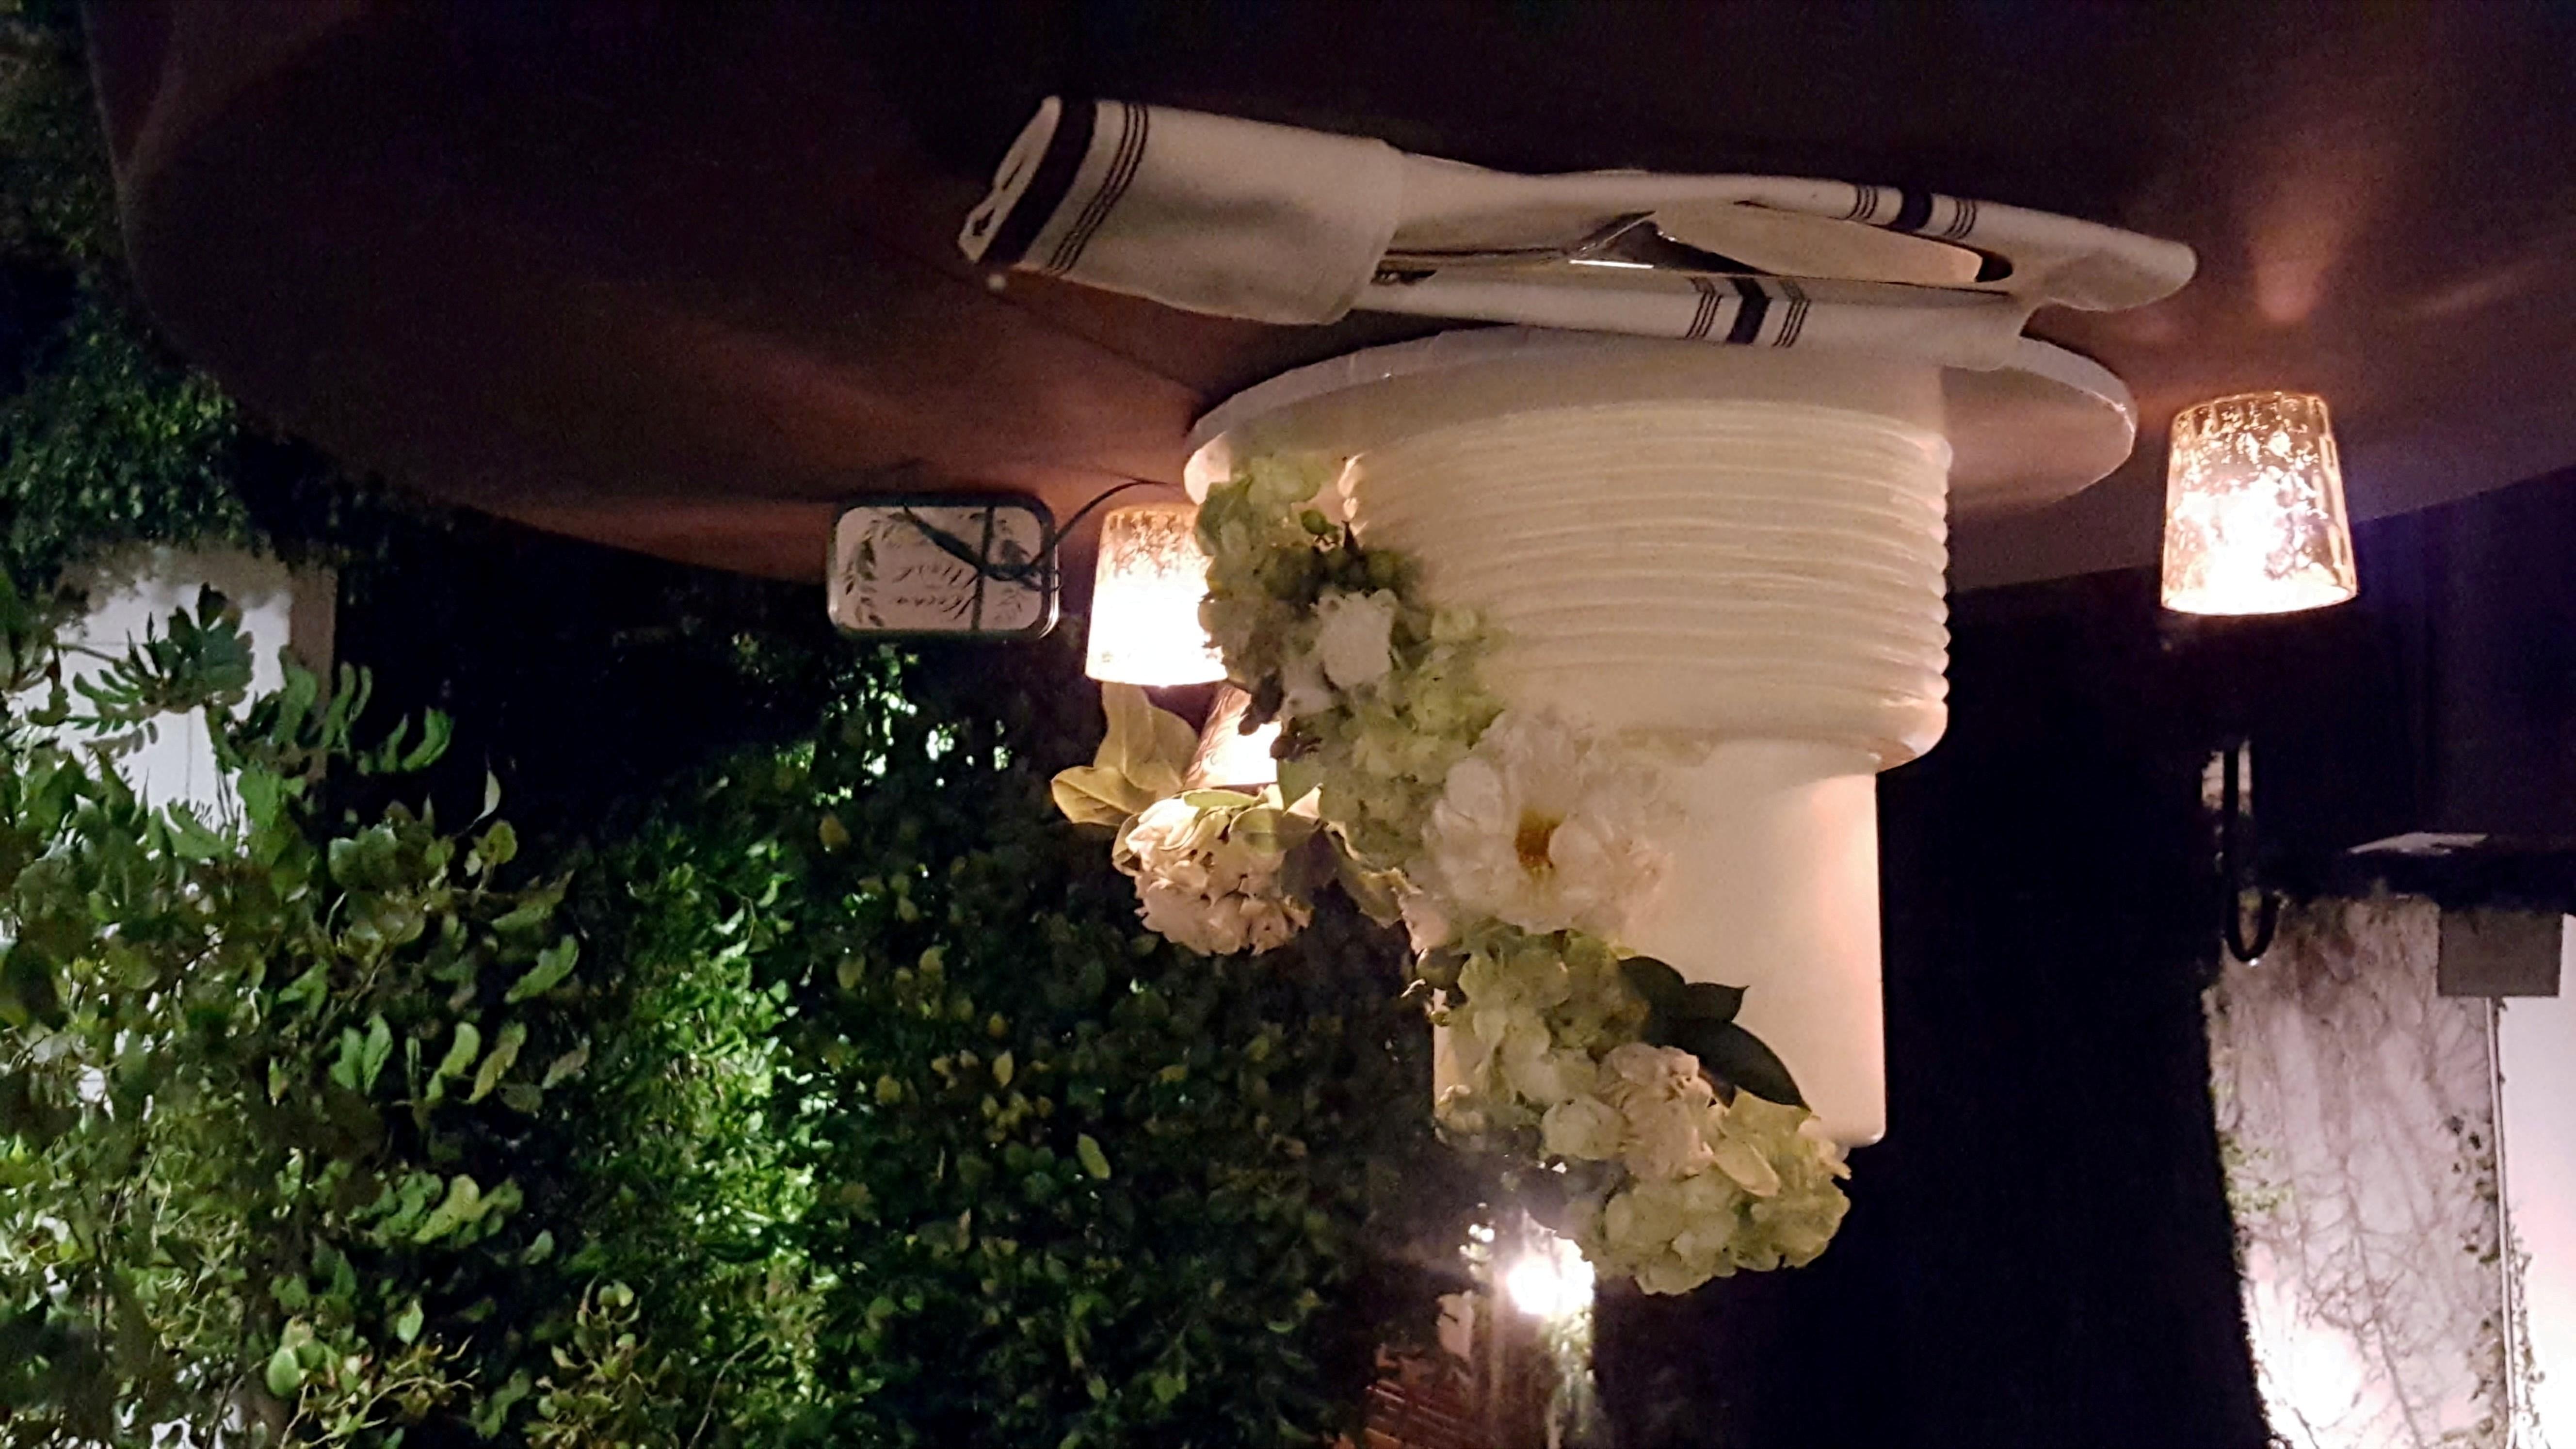 Sheenamark photography hanna costello california cake pastry swan palm desert ca flowers my little flower shop palm springs ca venue alcazar hotel palm mightylinksfo